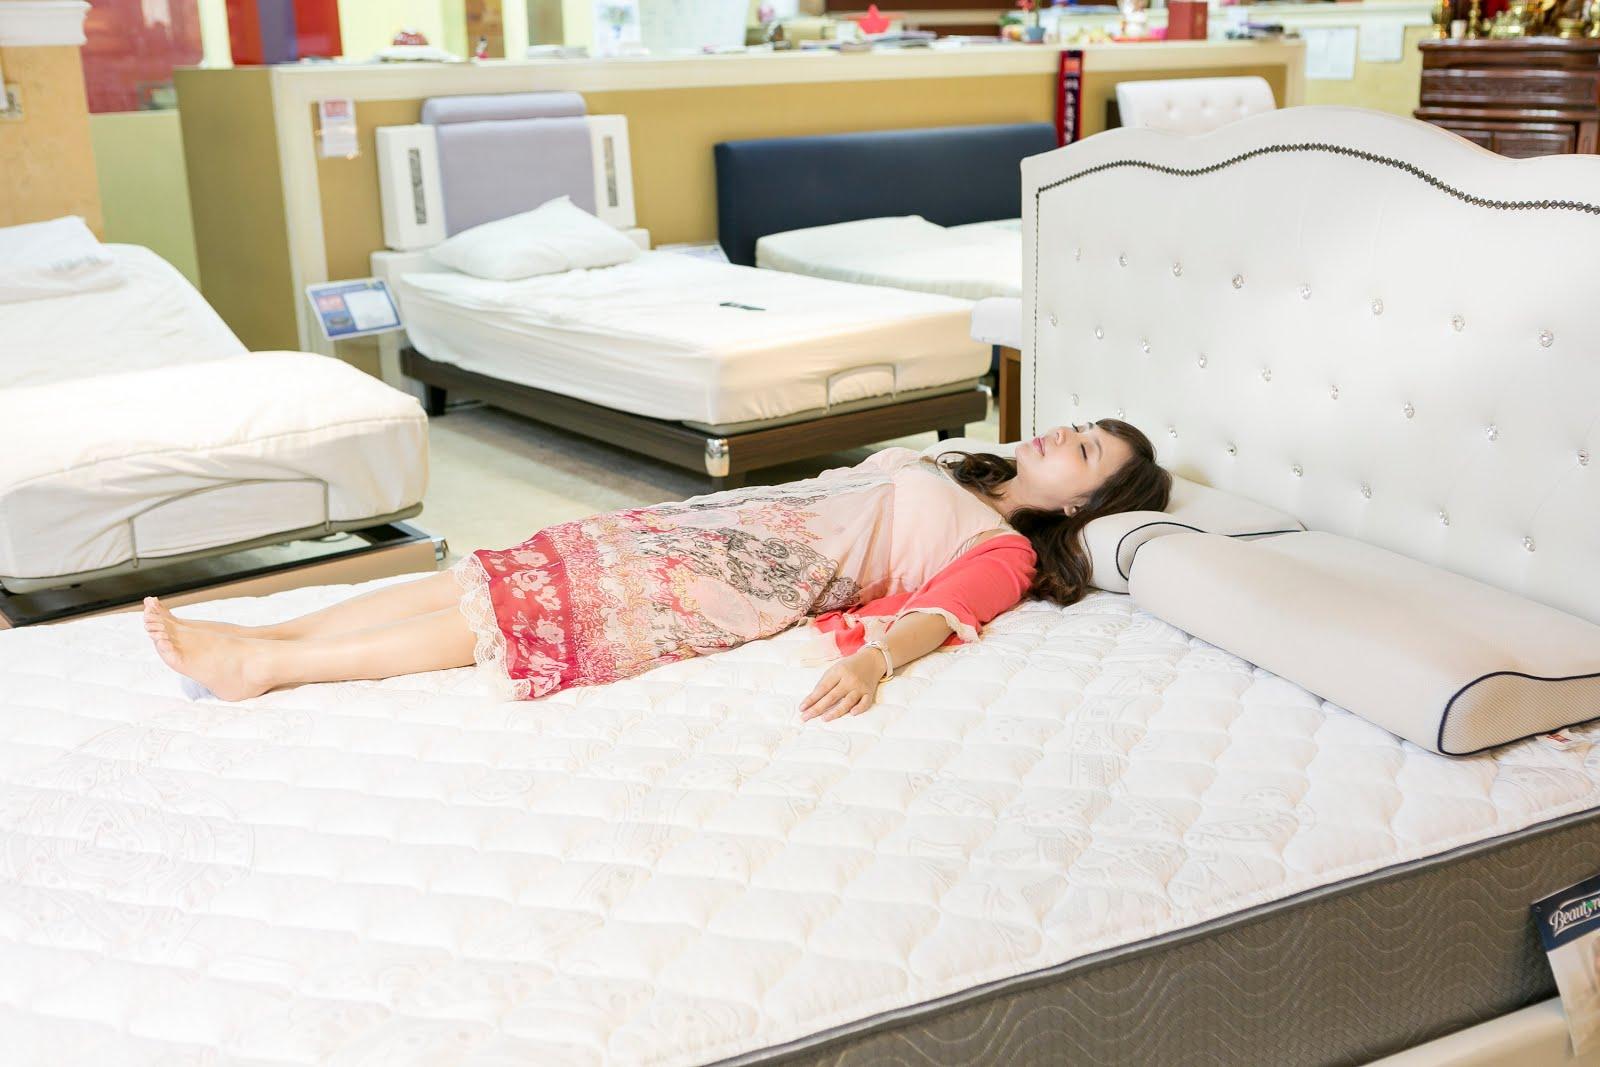 Bedding-world_dj%25E7%2590%25A6%25E7%2590%25A6_wwwhostkikicom_%25E5%2583%258F%25E5%25BD%2588%25E9%258B%25BC%25E7%2590%25B4.jpg-天天享受睡眠SPA | 席夢思兩萬有找 走一趟床的世界 選張好床吧